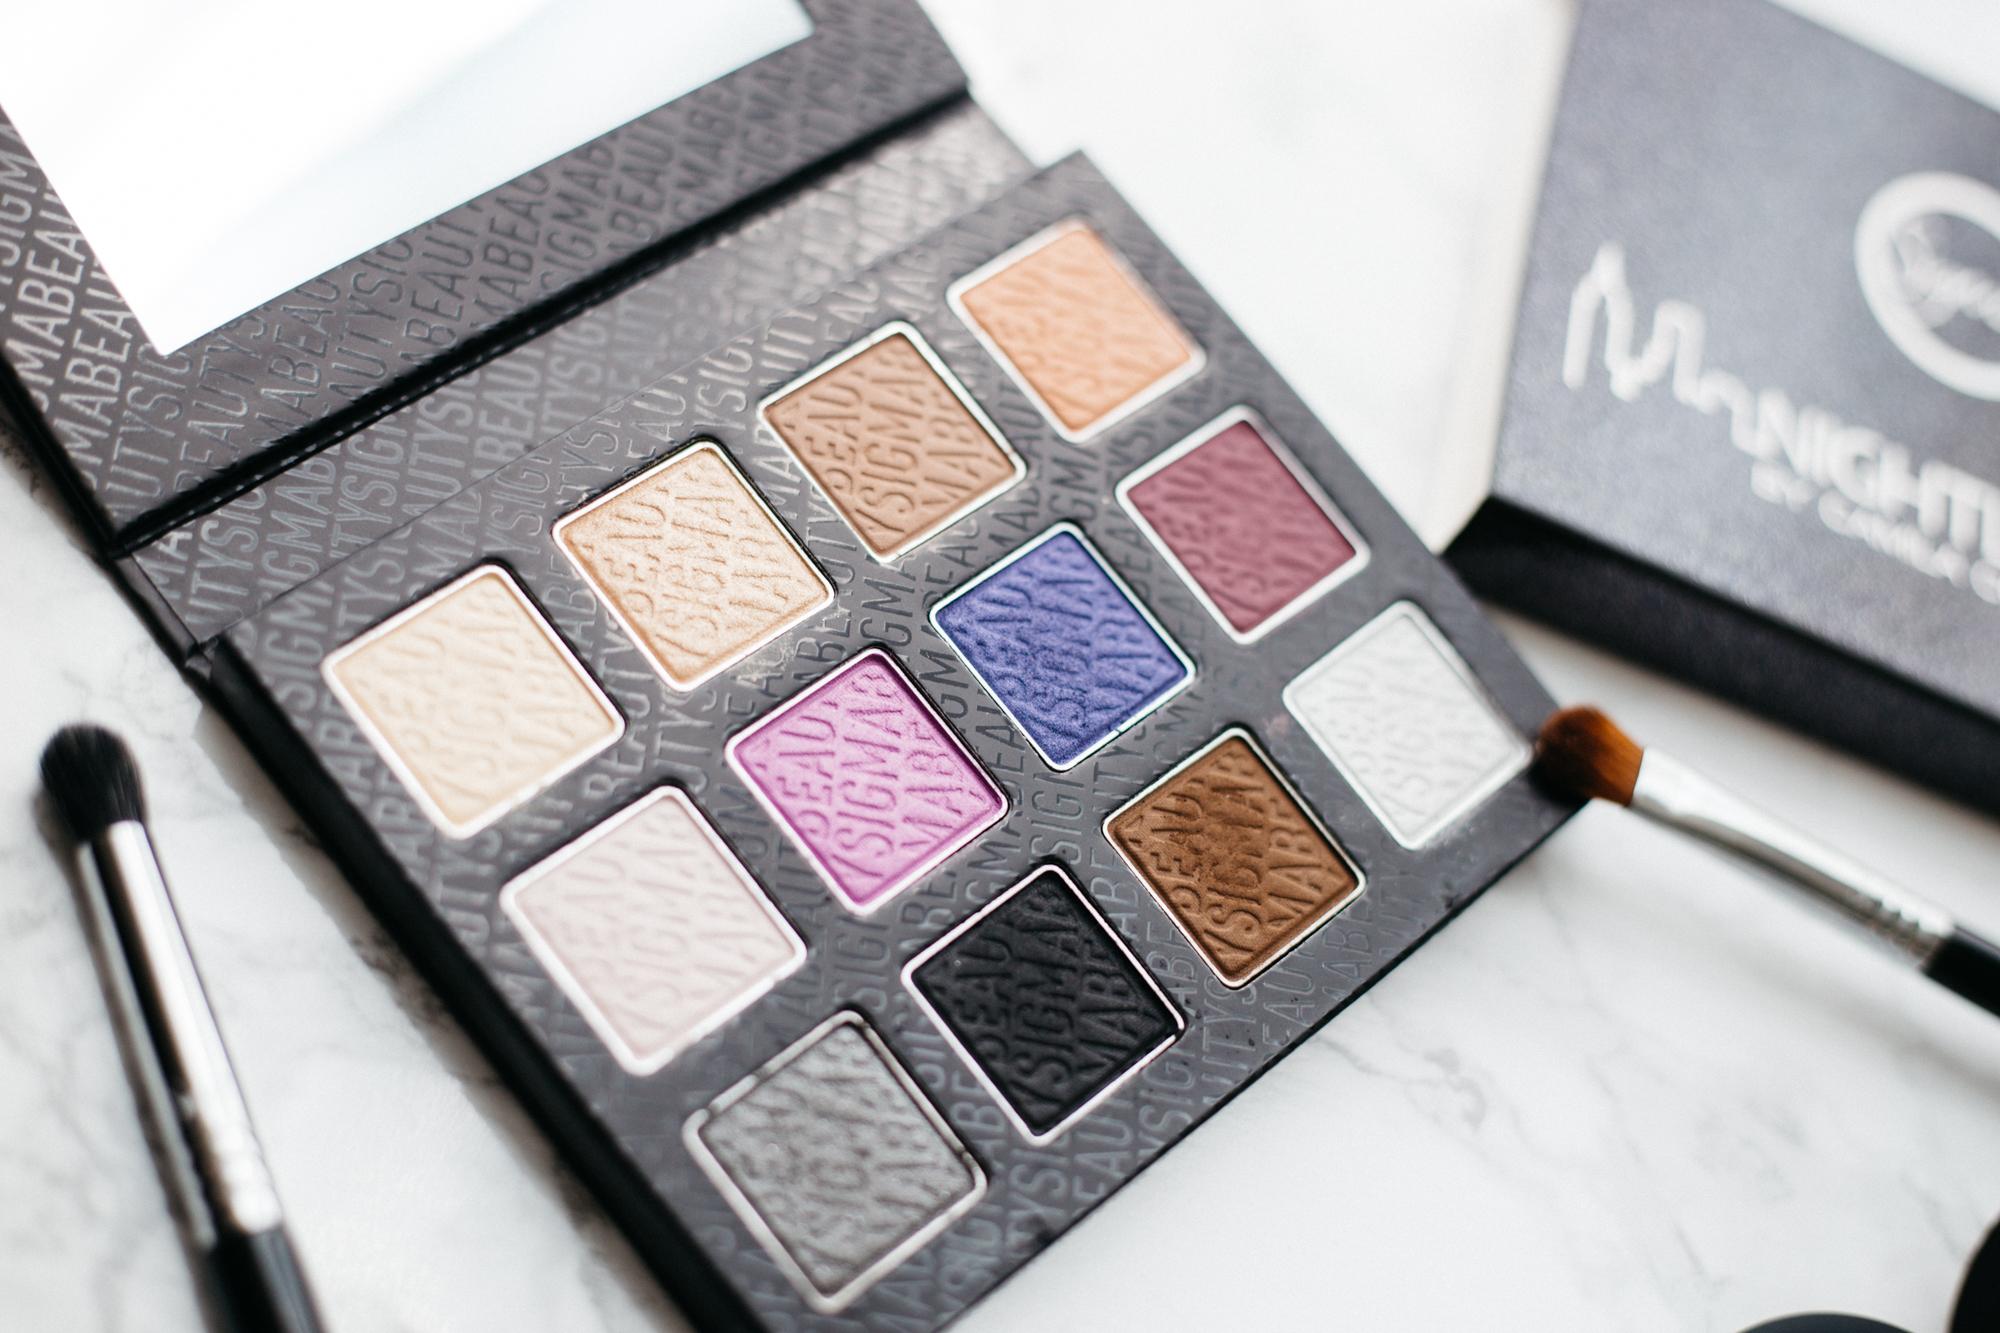 Sigma Beauty Nightlife Eyeshadow Palette